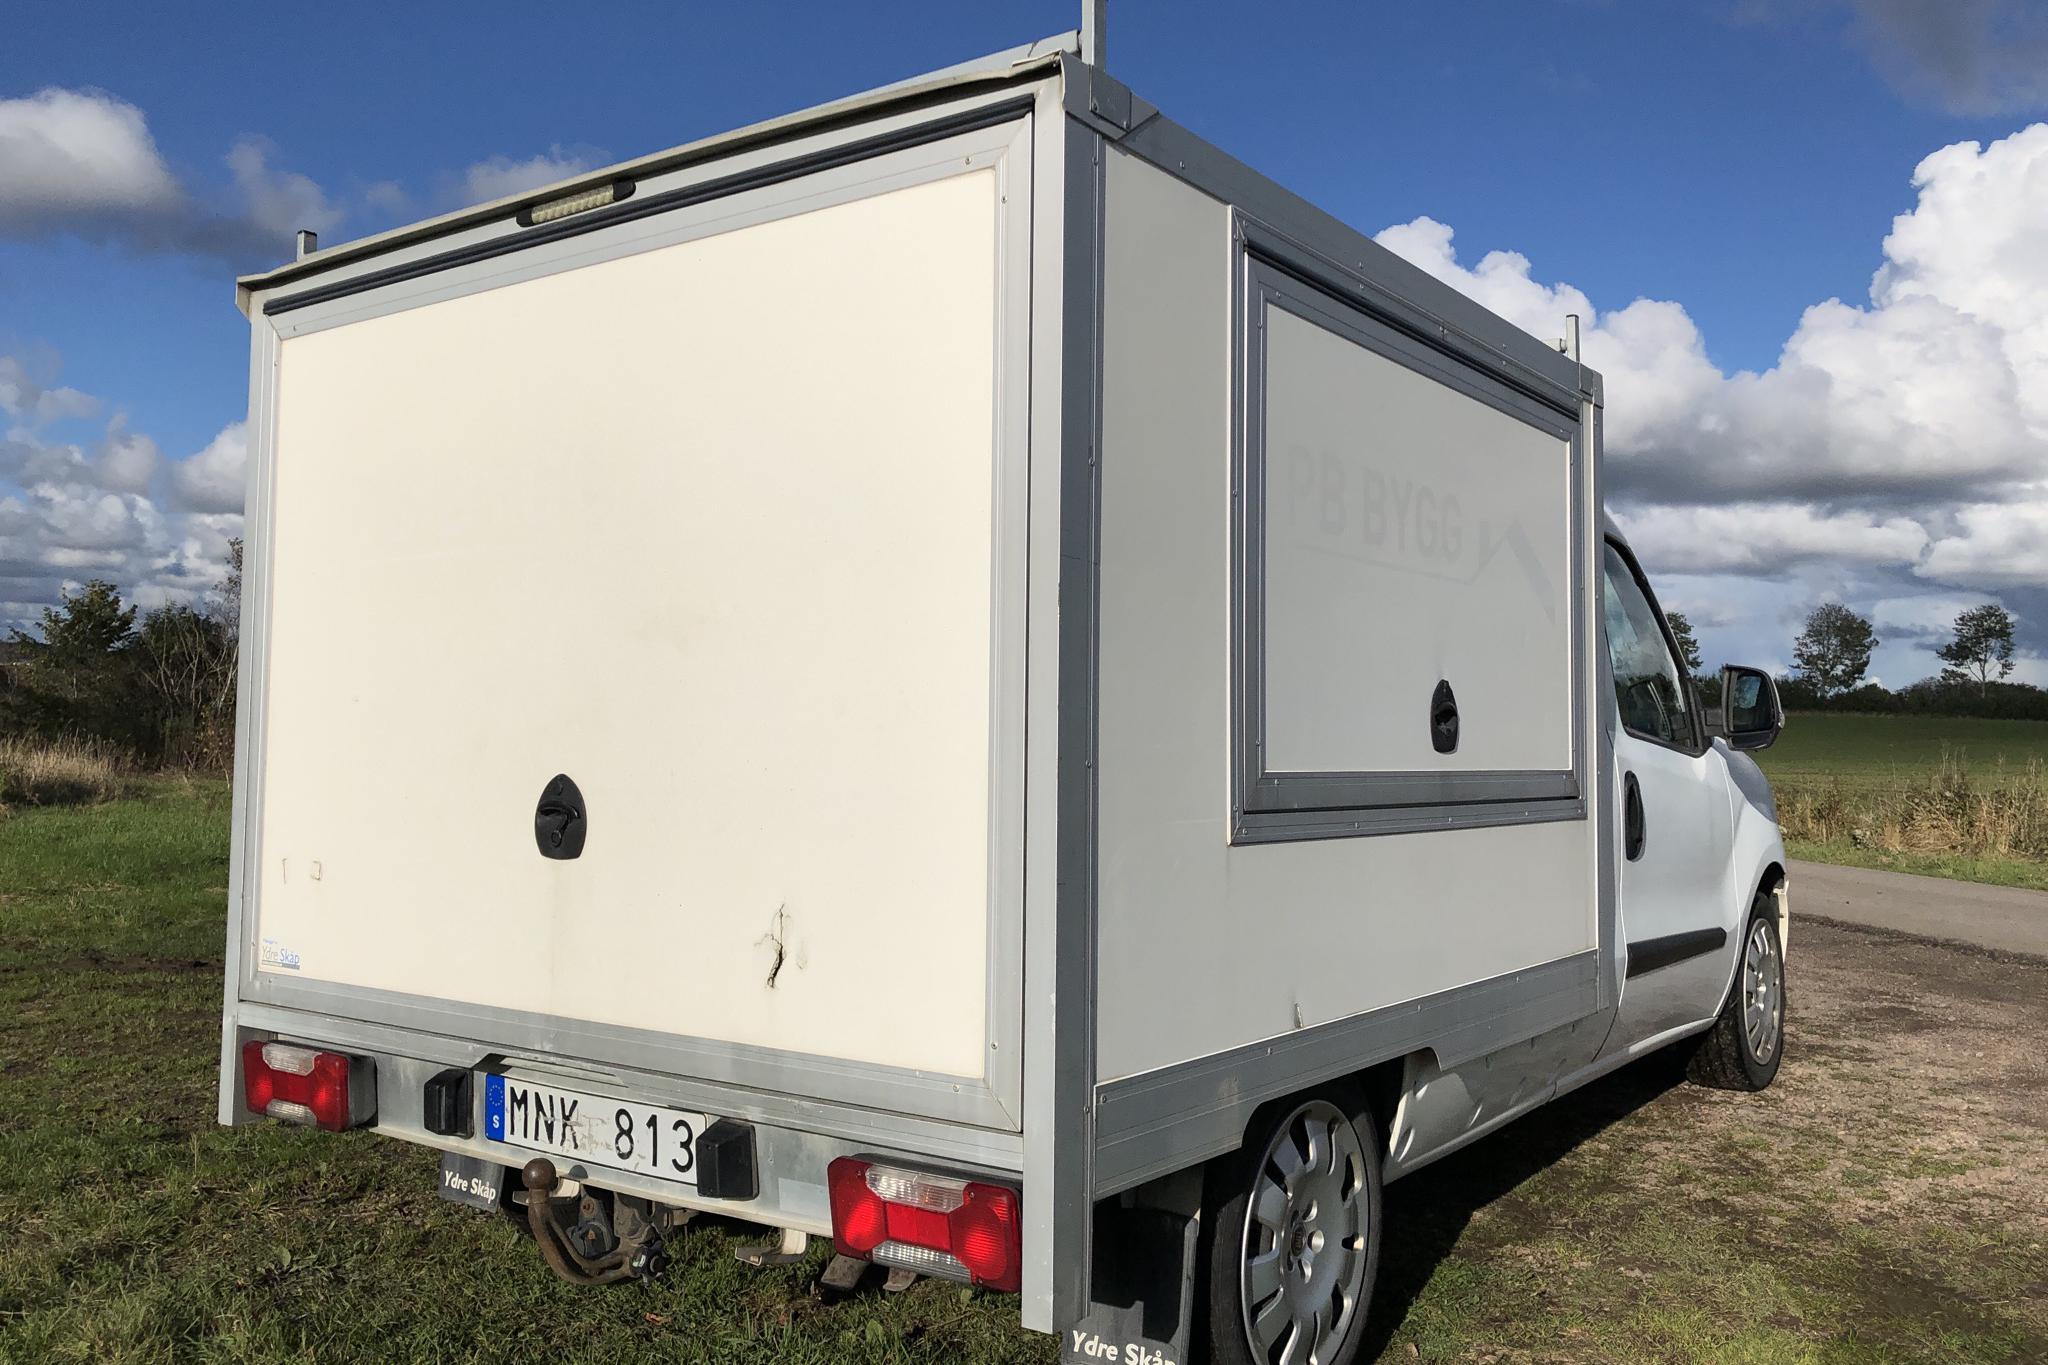 Fiat Doblo Cargo 1.3 Multijet (90hk) - 0 mil - Manuell - vit - 2012